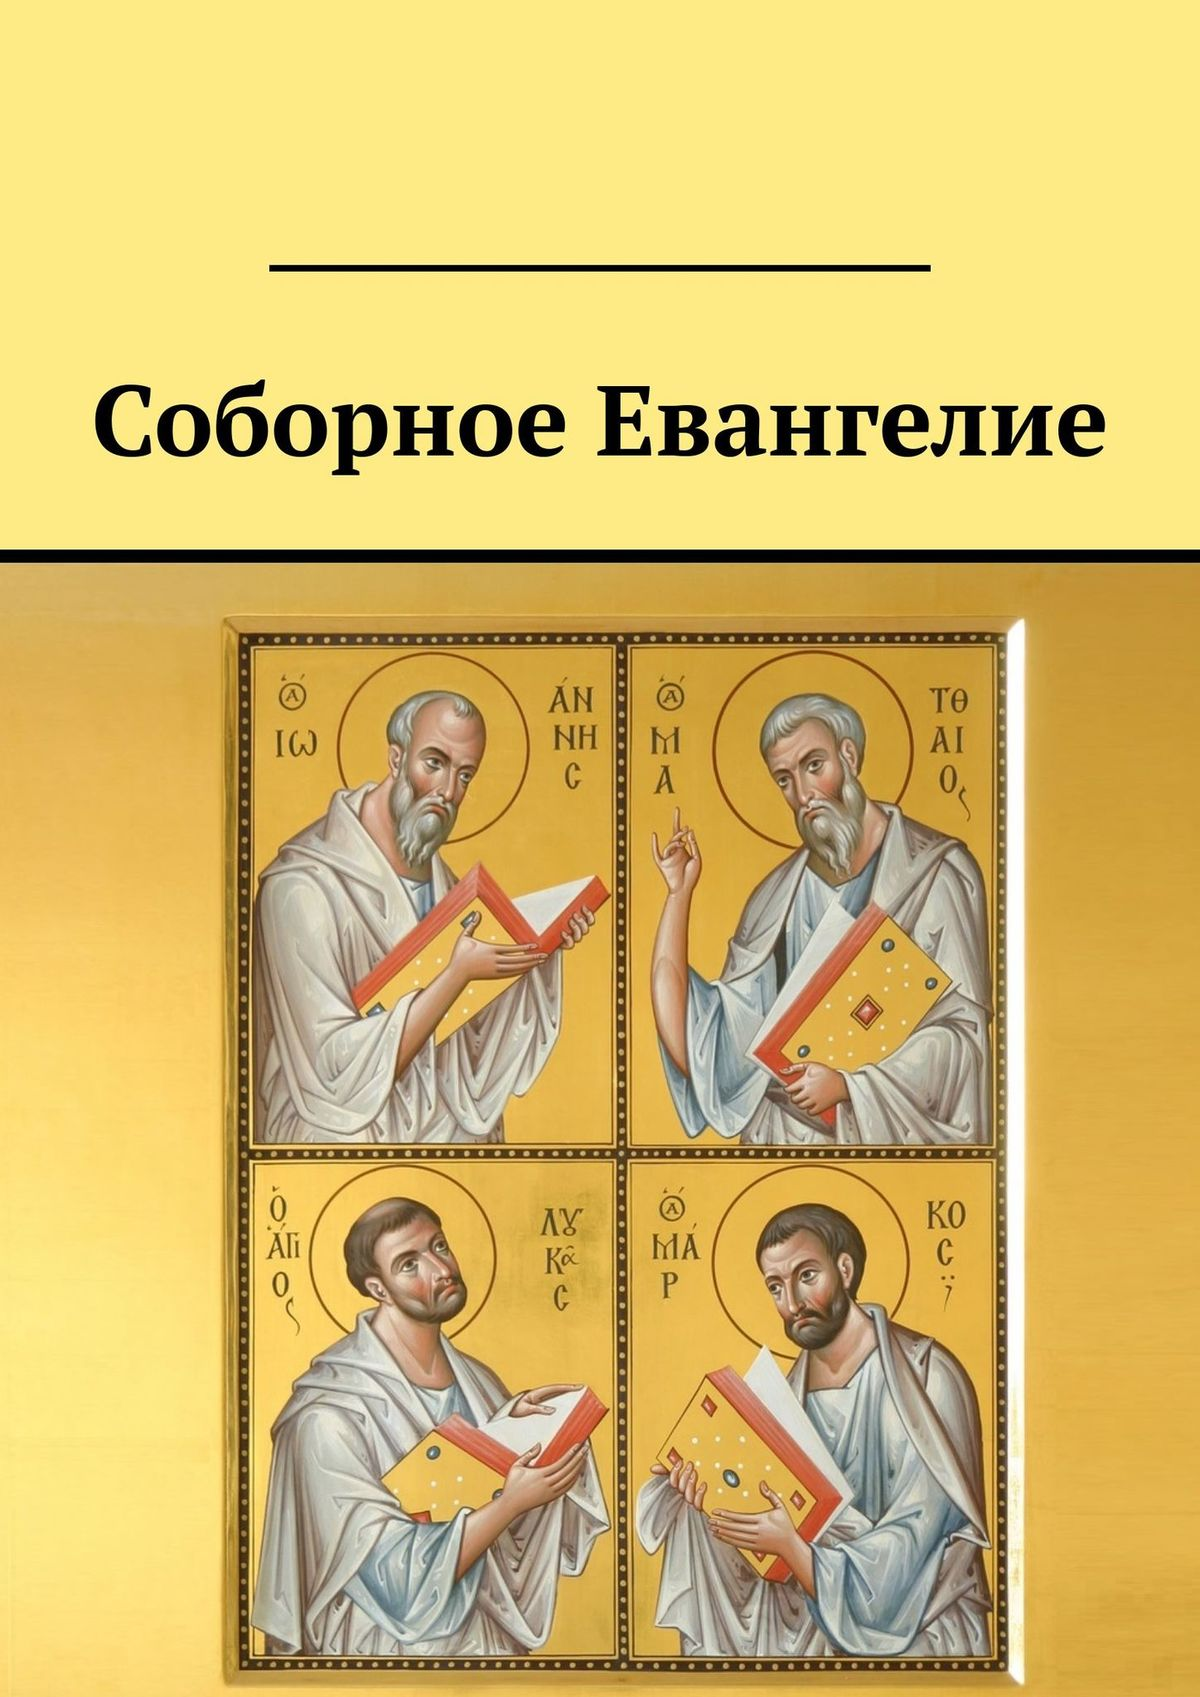 Соборное Евангелие